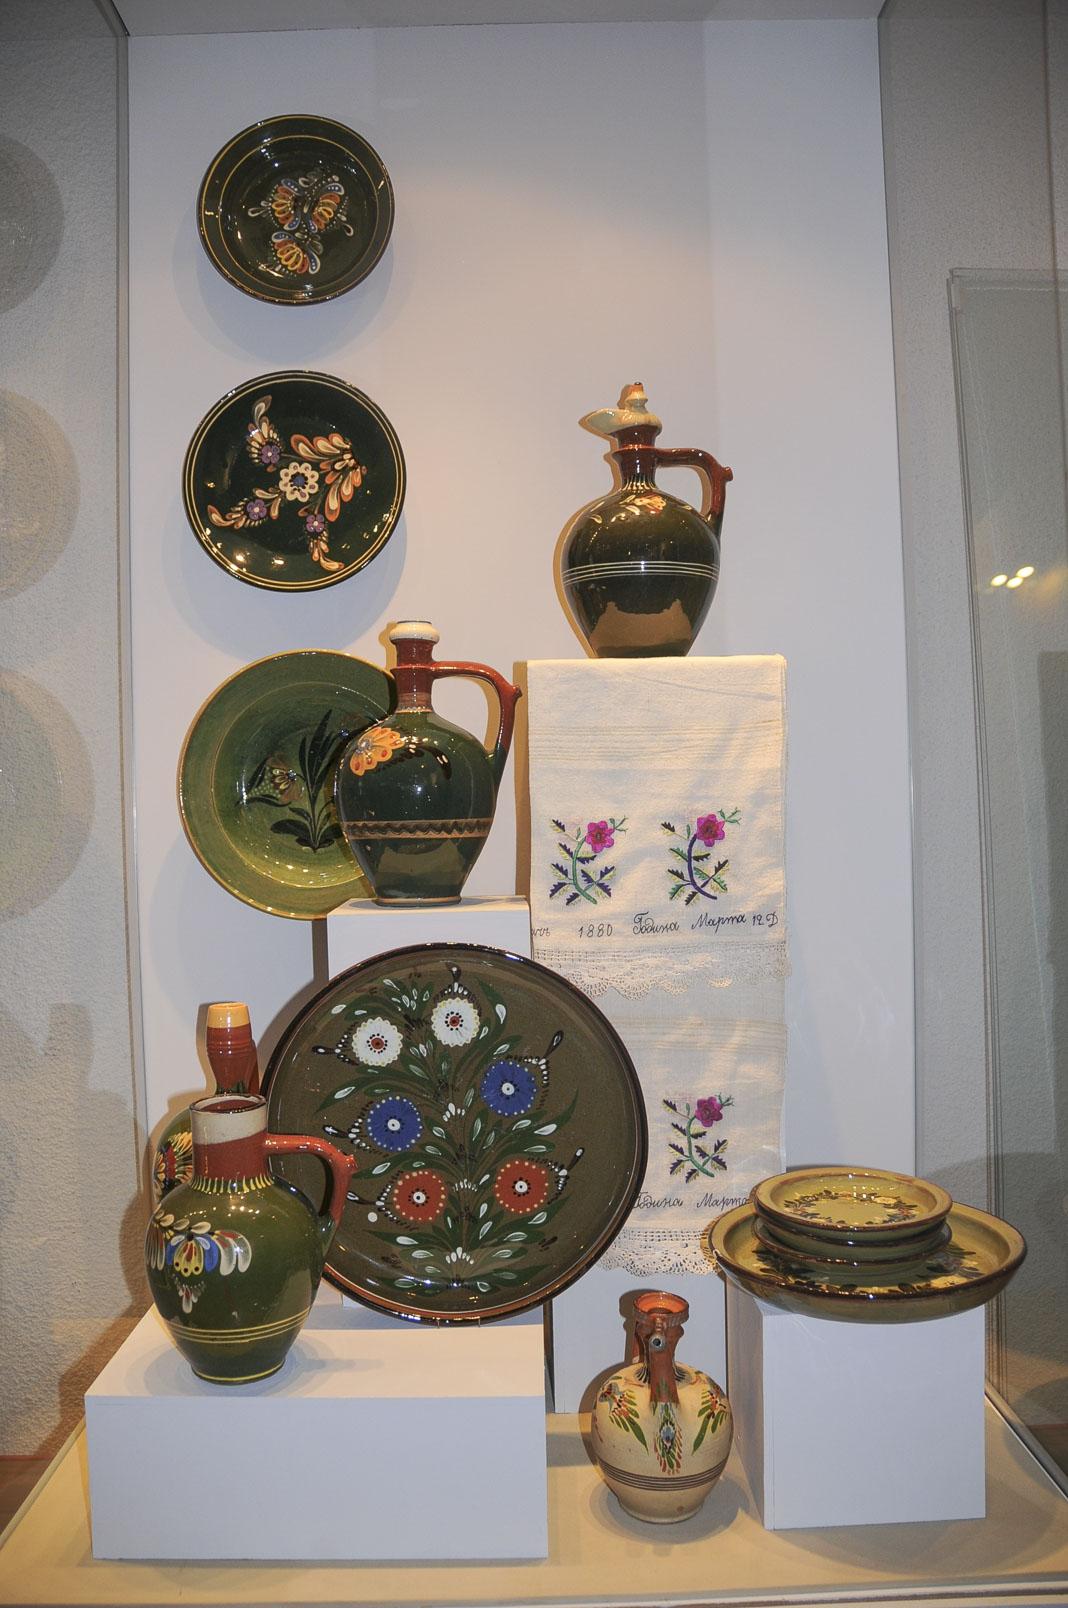 troyan-museum-cvetqta-na-zografa-3